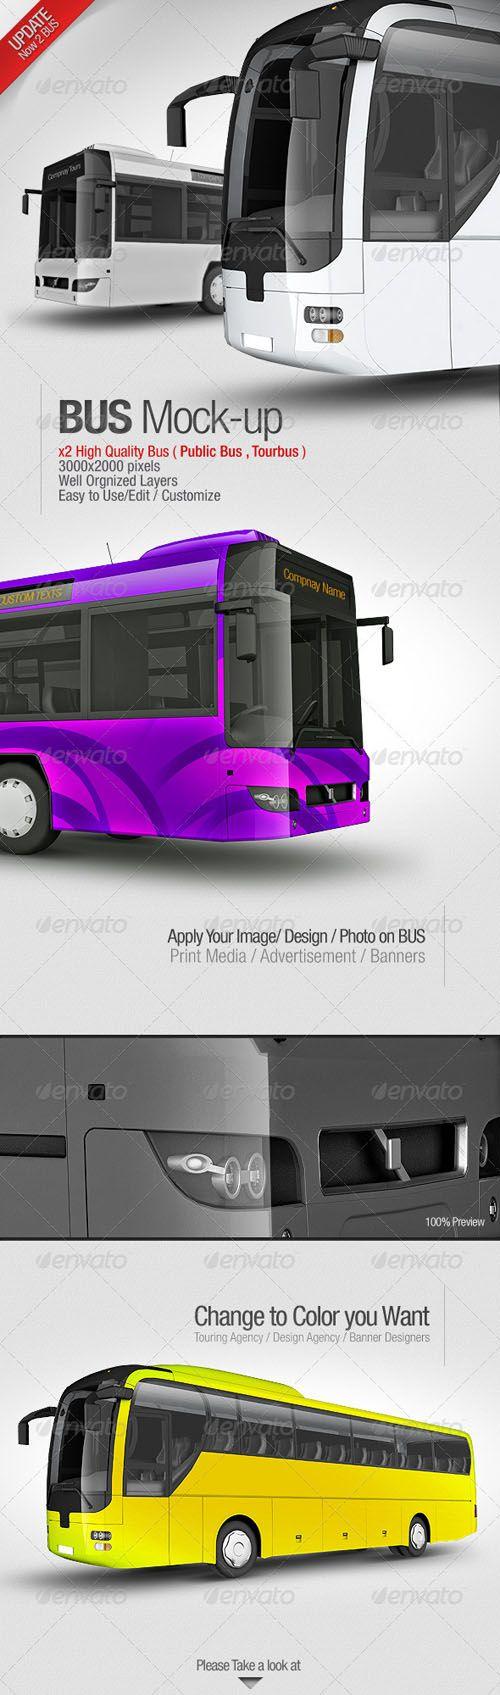 Mock Up Templates Psd Bus Mockup Mockup Design